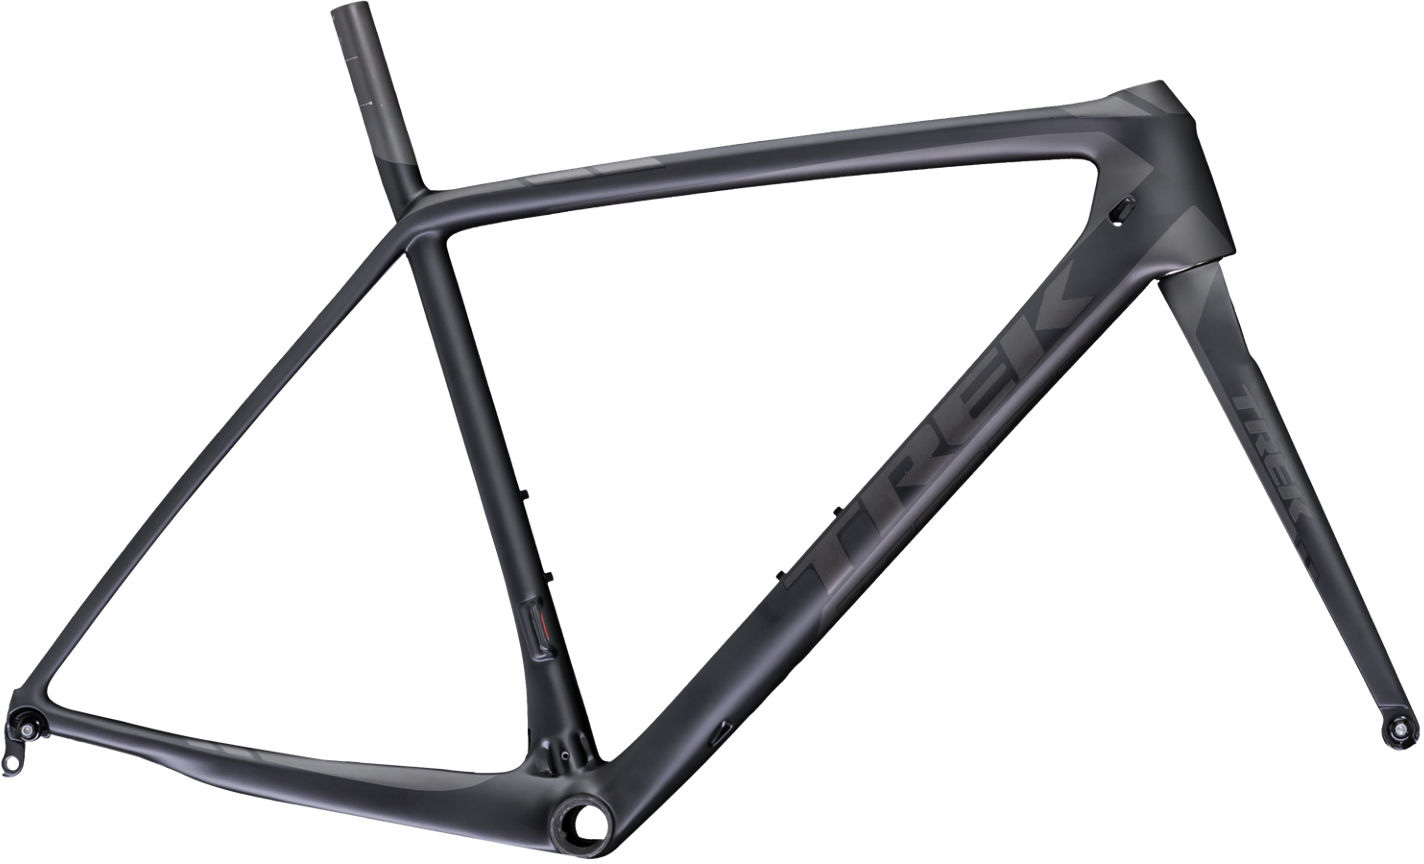 eb3a209112b Trek Madone 7 Series Frameset - Marty's Reliable Cycle